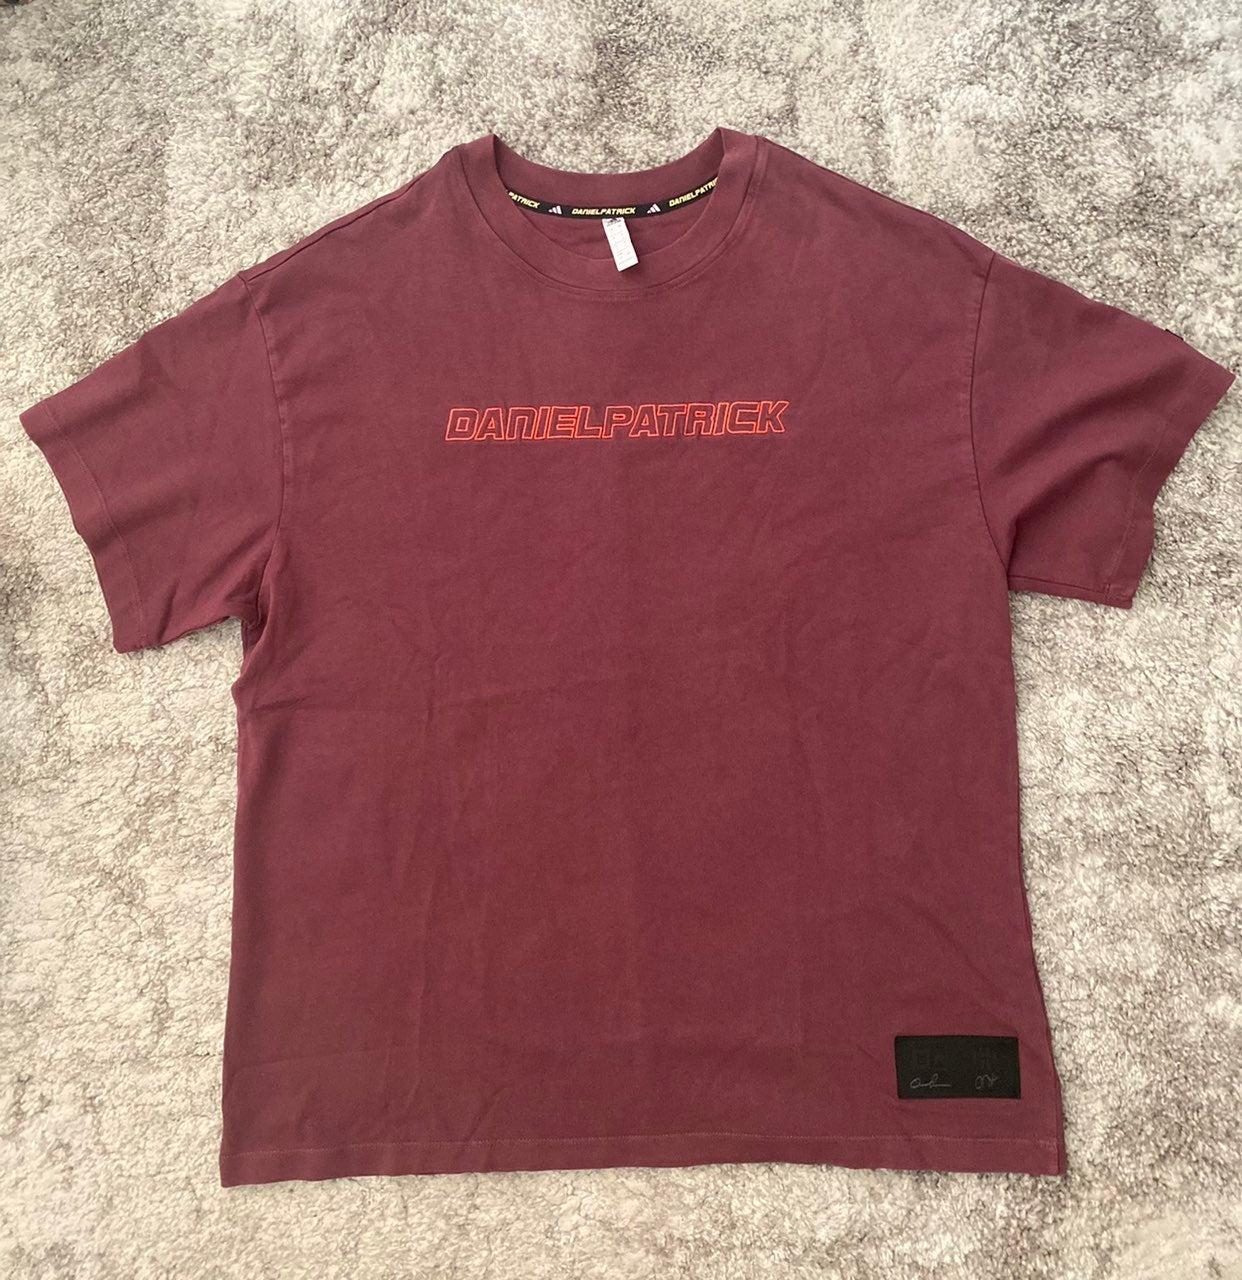 Adidas Daniel Patrick Shirt Burgundy JH